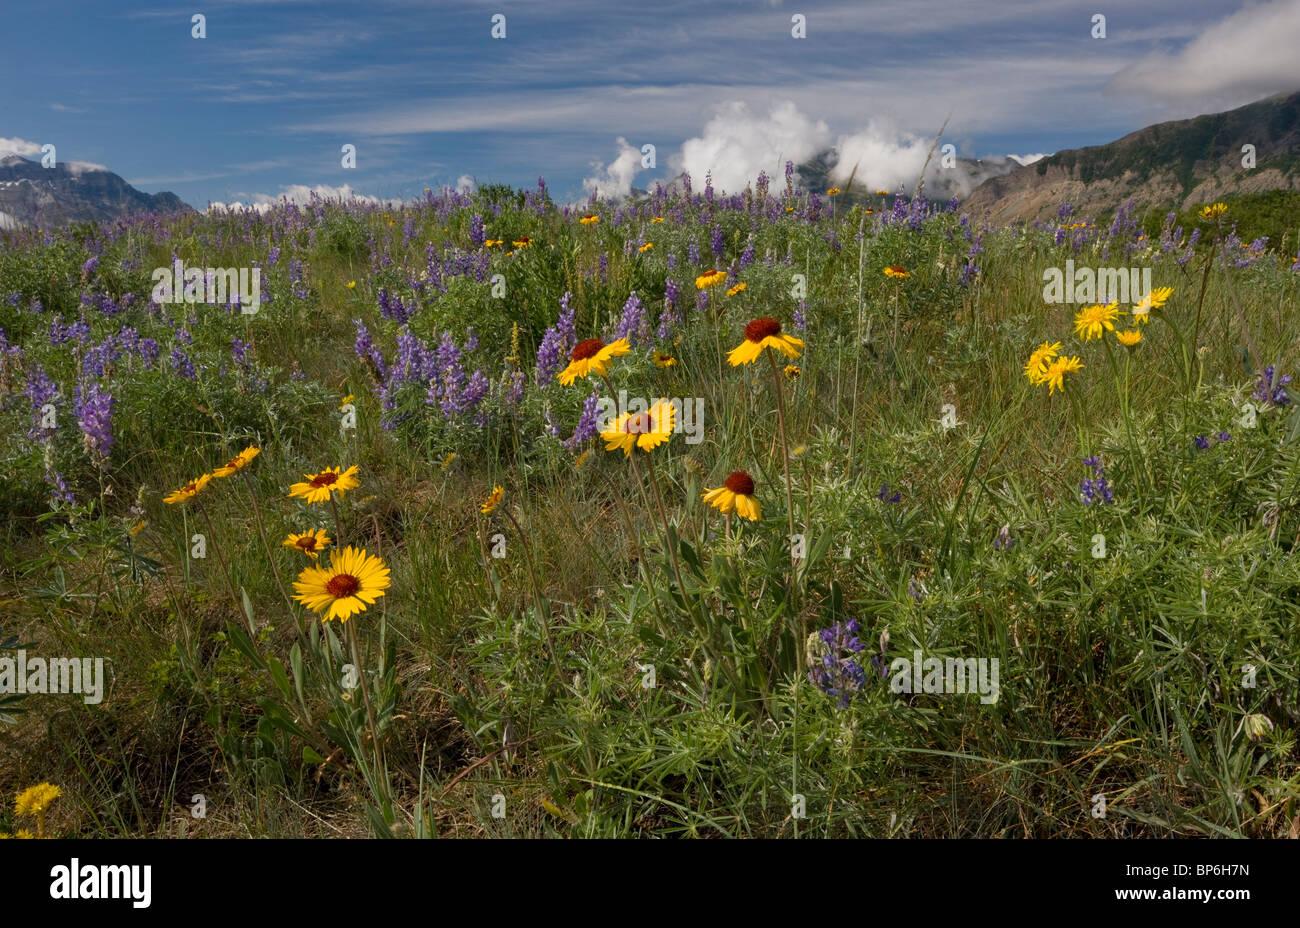 Blanketflower commun ou conjoint, gaillardia Gaillardia aristata, lupins et autres fleurs dans les prairies, les Photo Stock